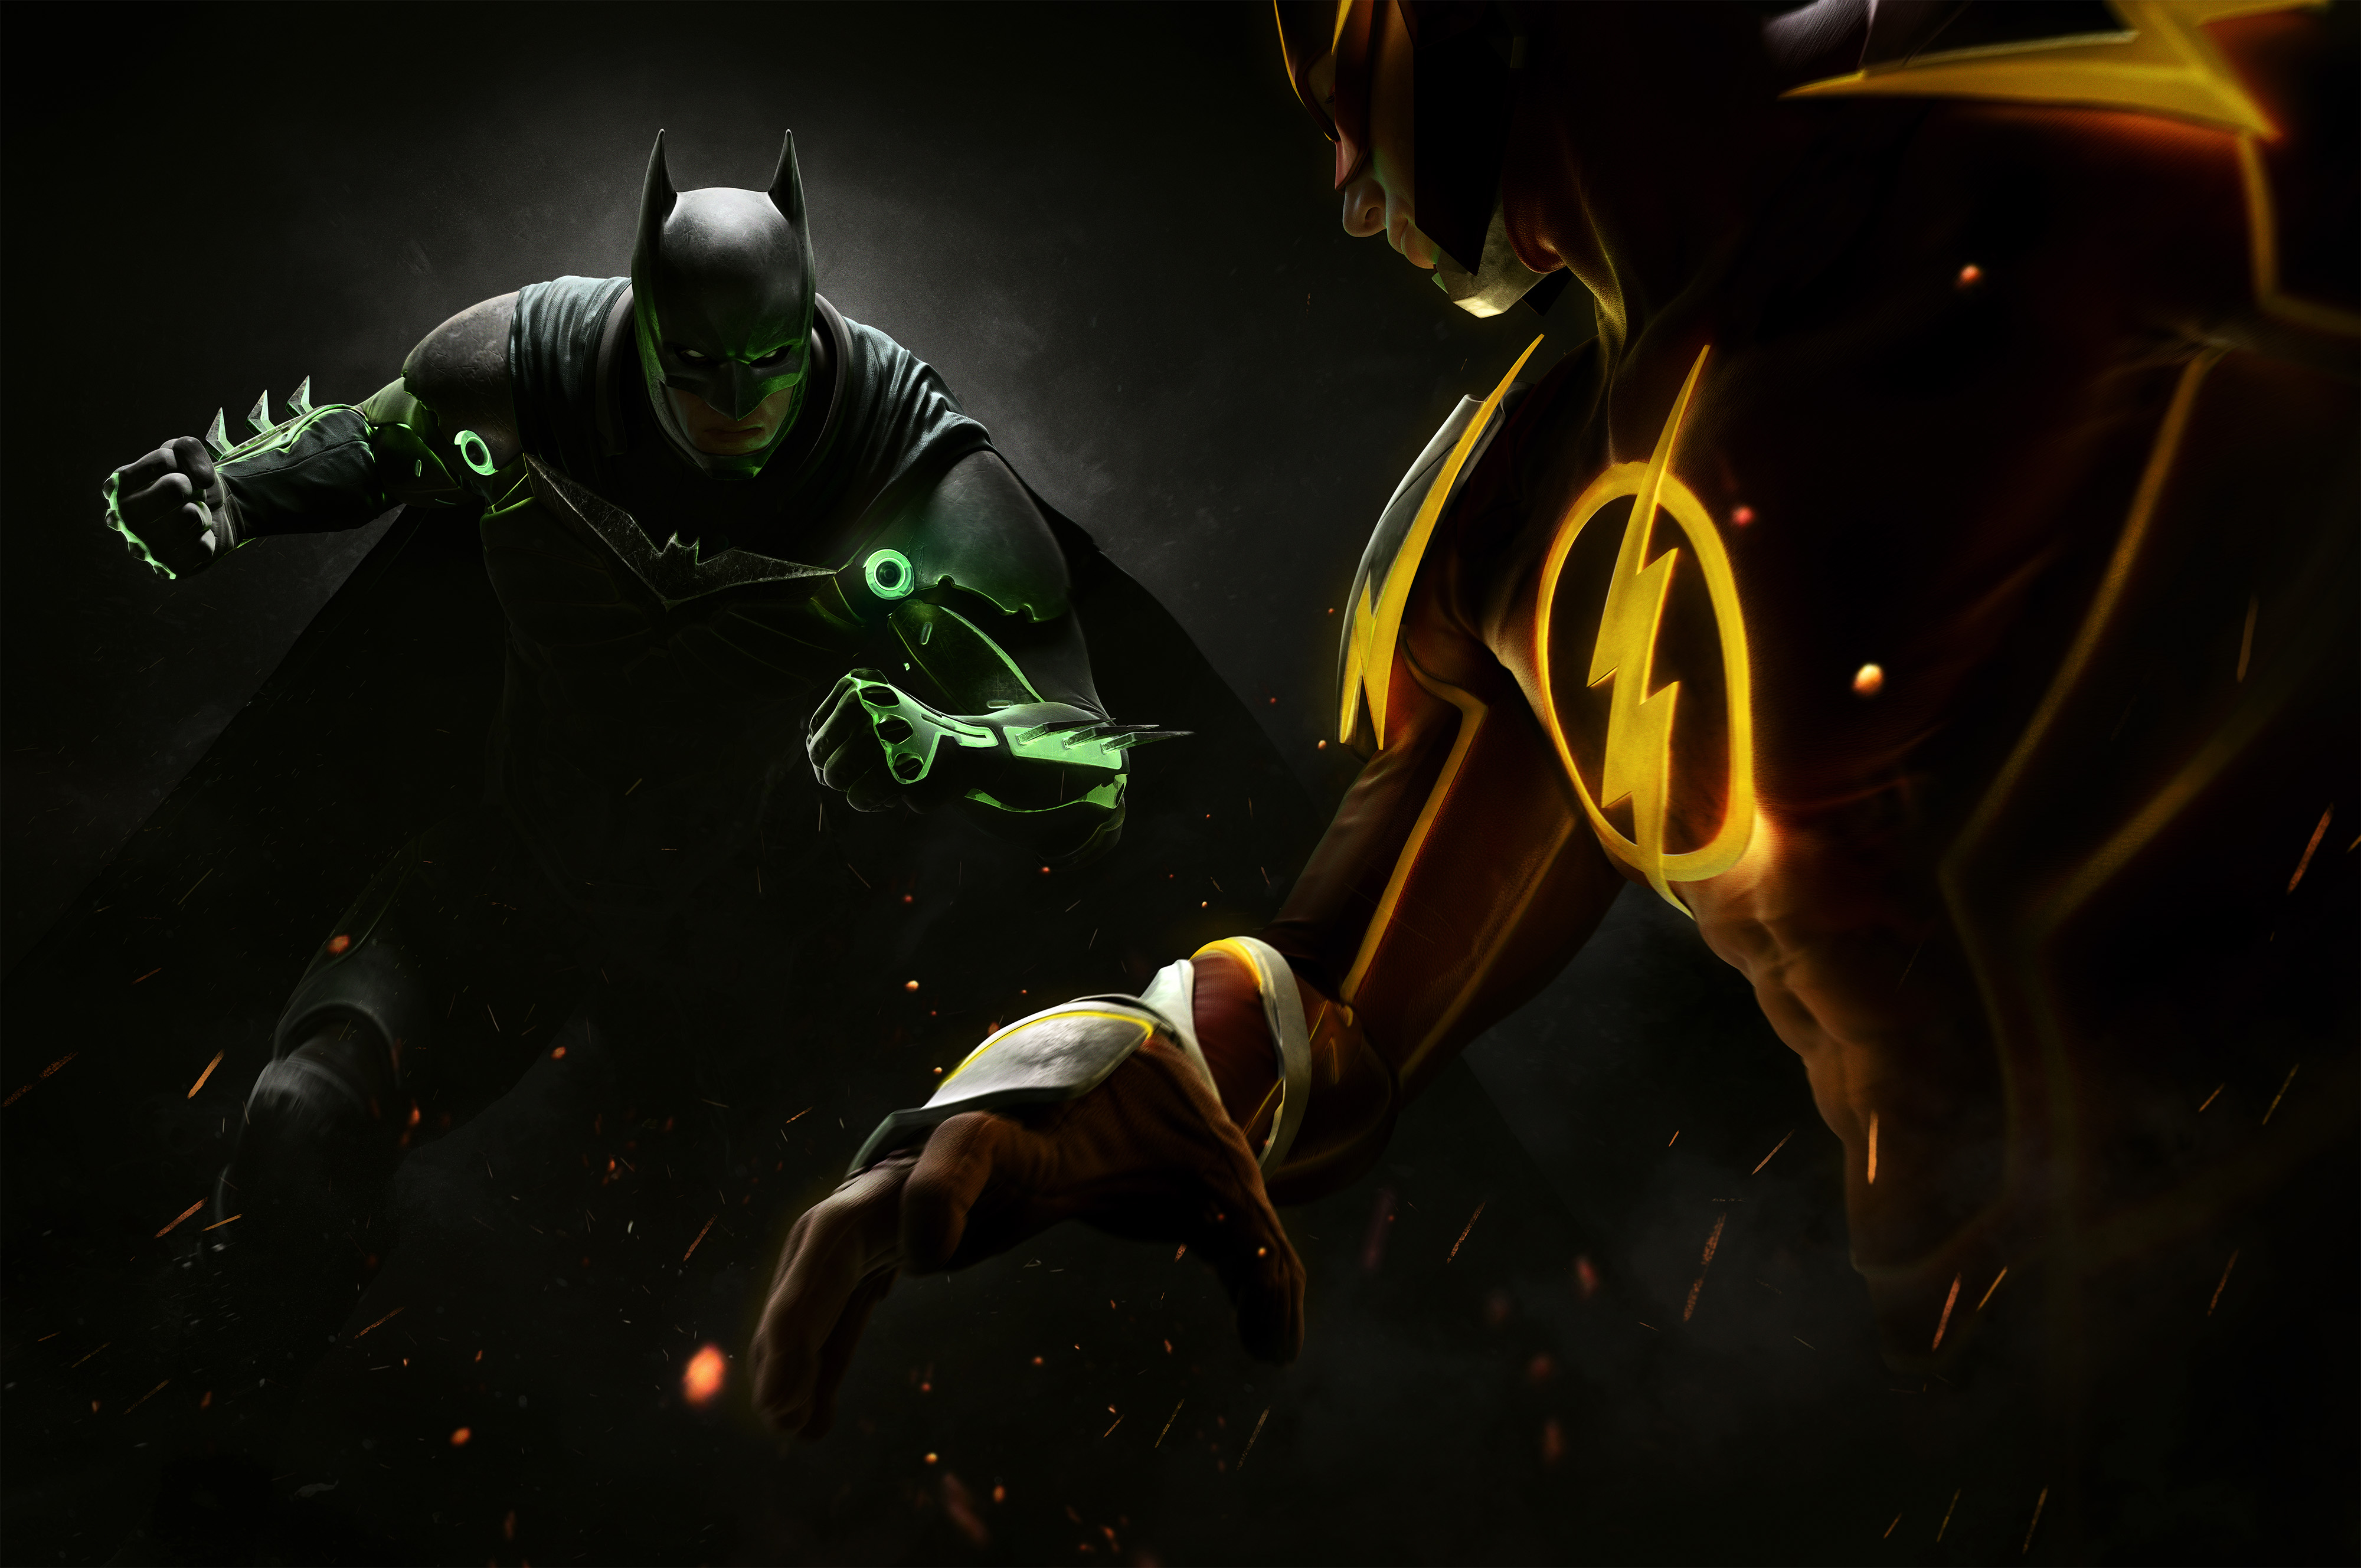 Photos Injustice 2 Heroes comics Batman hero The Flash hero vdeo game 4000x2657 superheroes Games